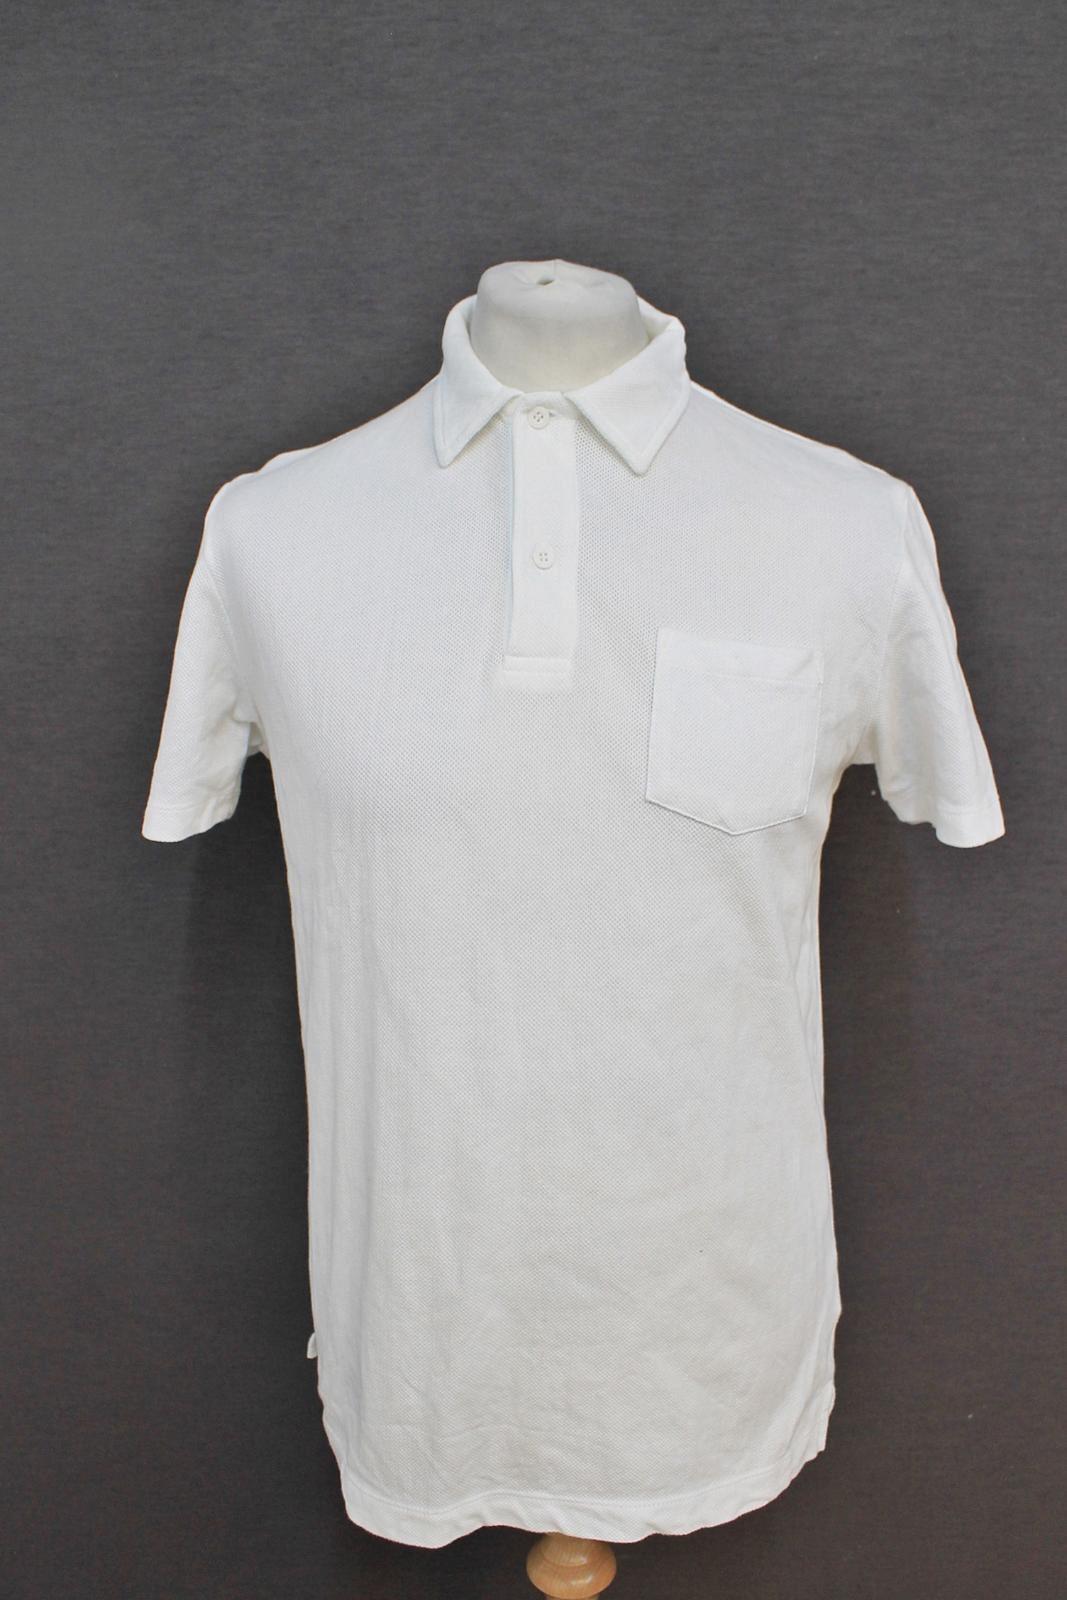 aafc96e8 SUNSPEL Men's Ivory Cream Short Sleeved Cotton Collared Polo Shirt ...